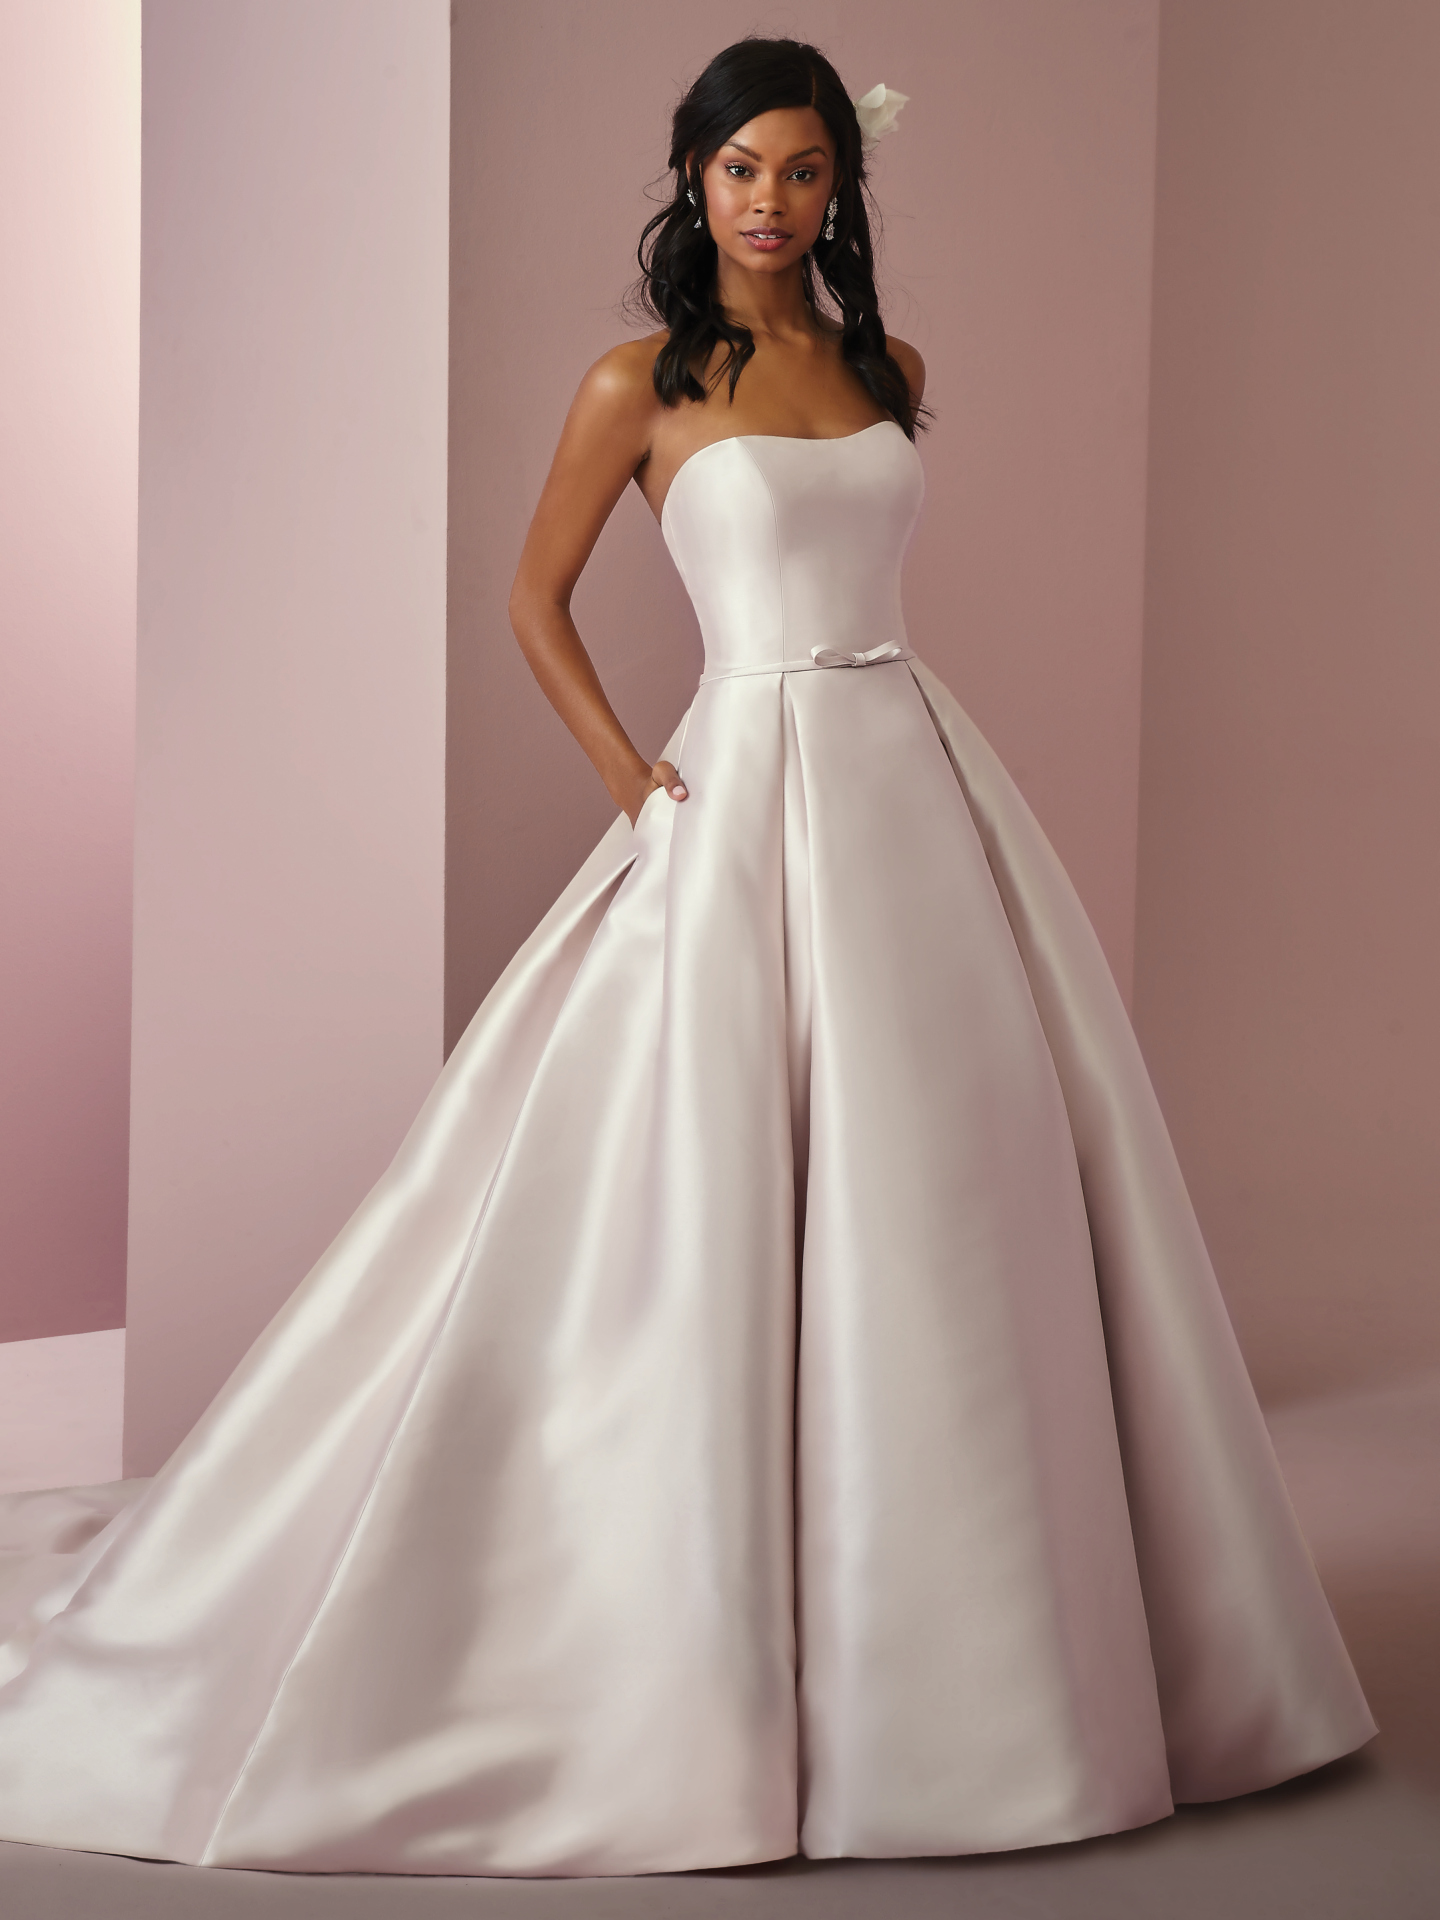 7022eef2392b Silk And Wedding Dress Alternatives For The Glamorous Bride